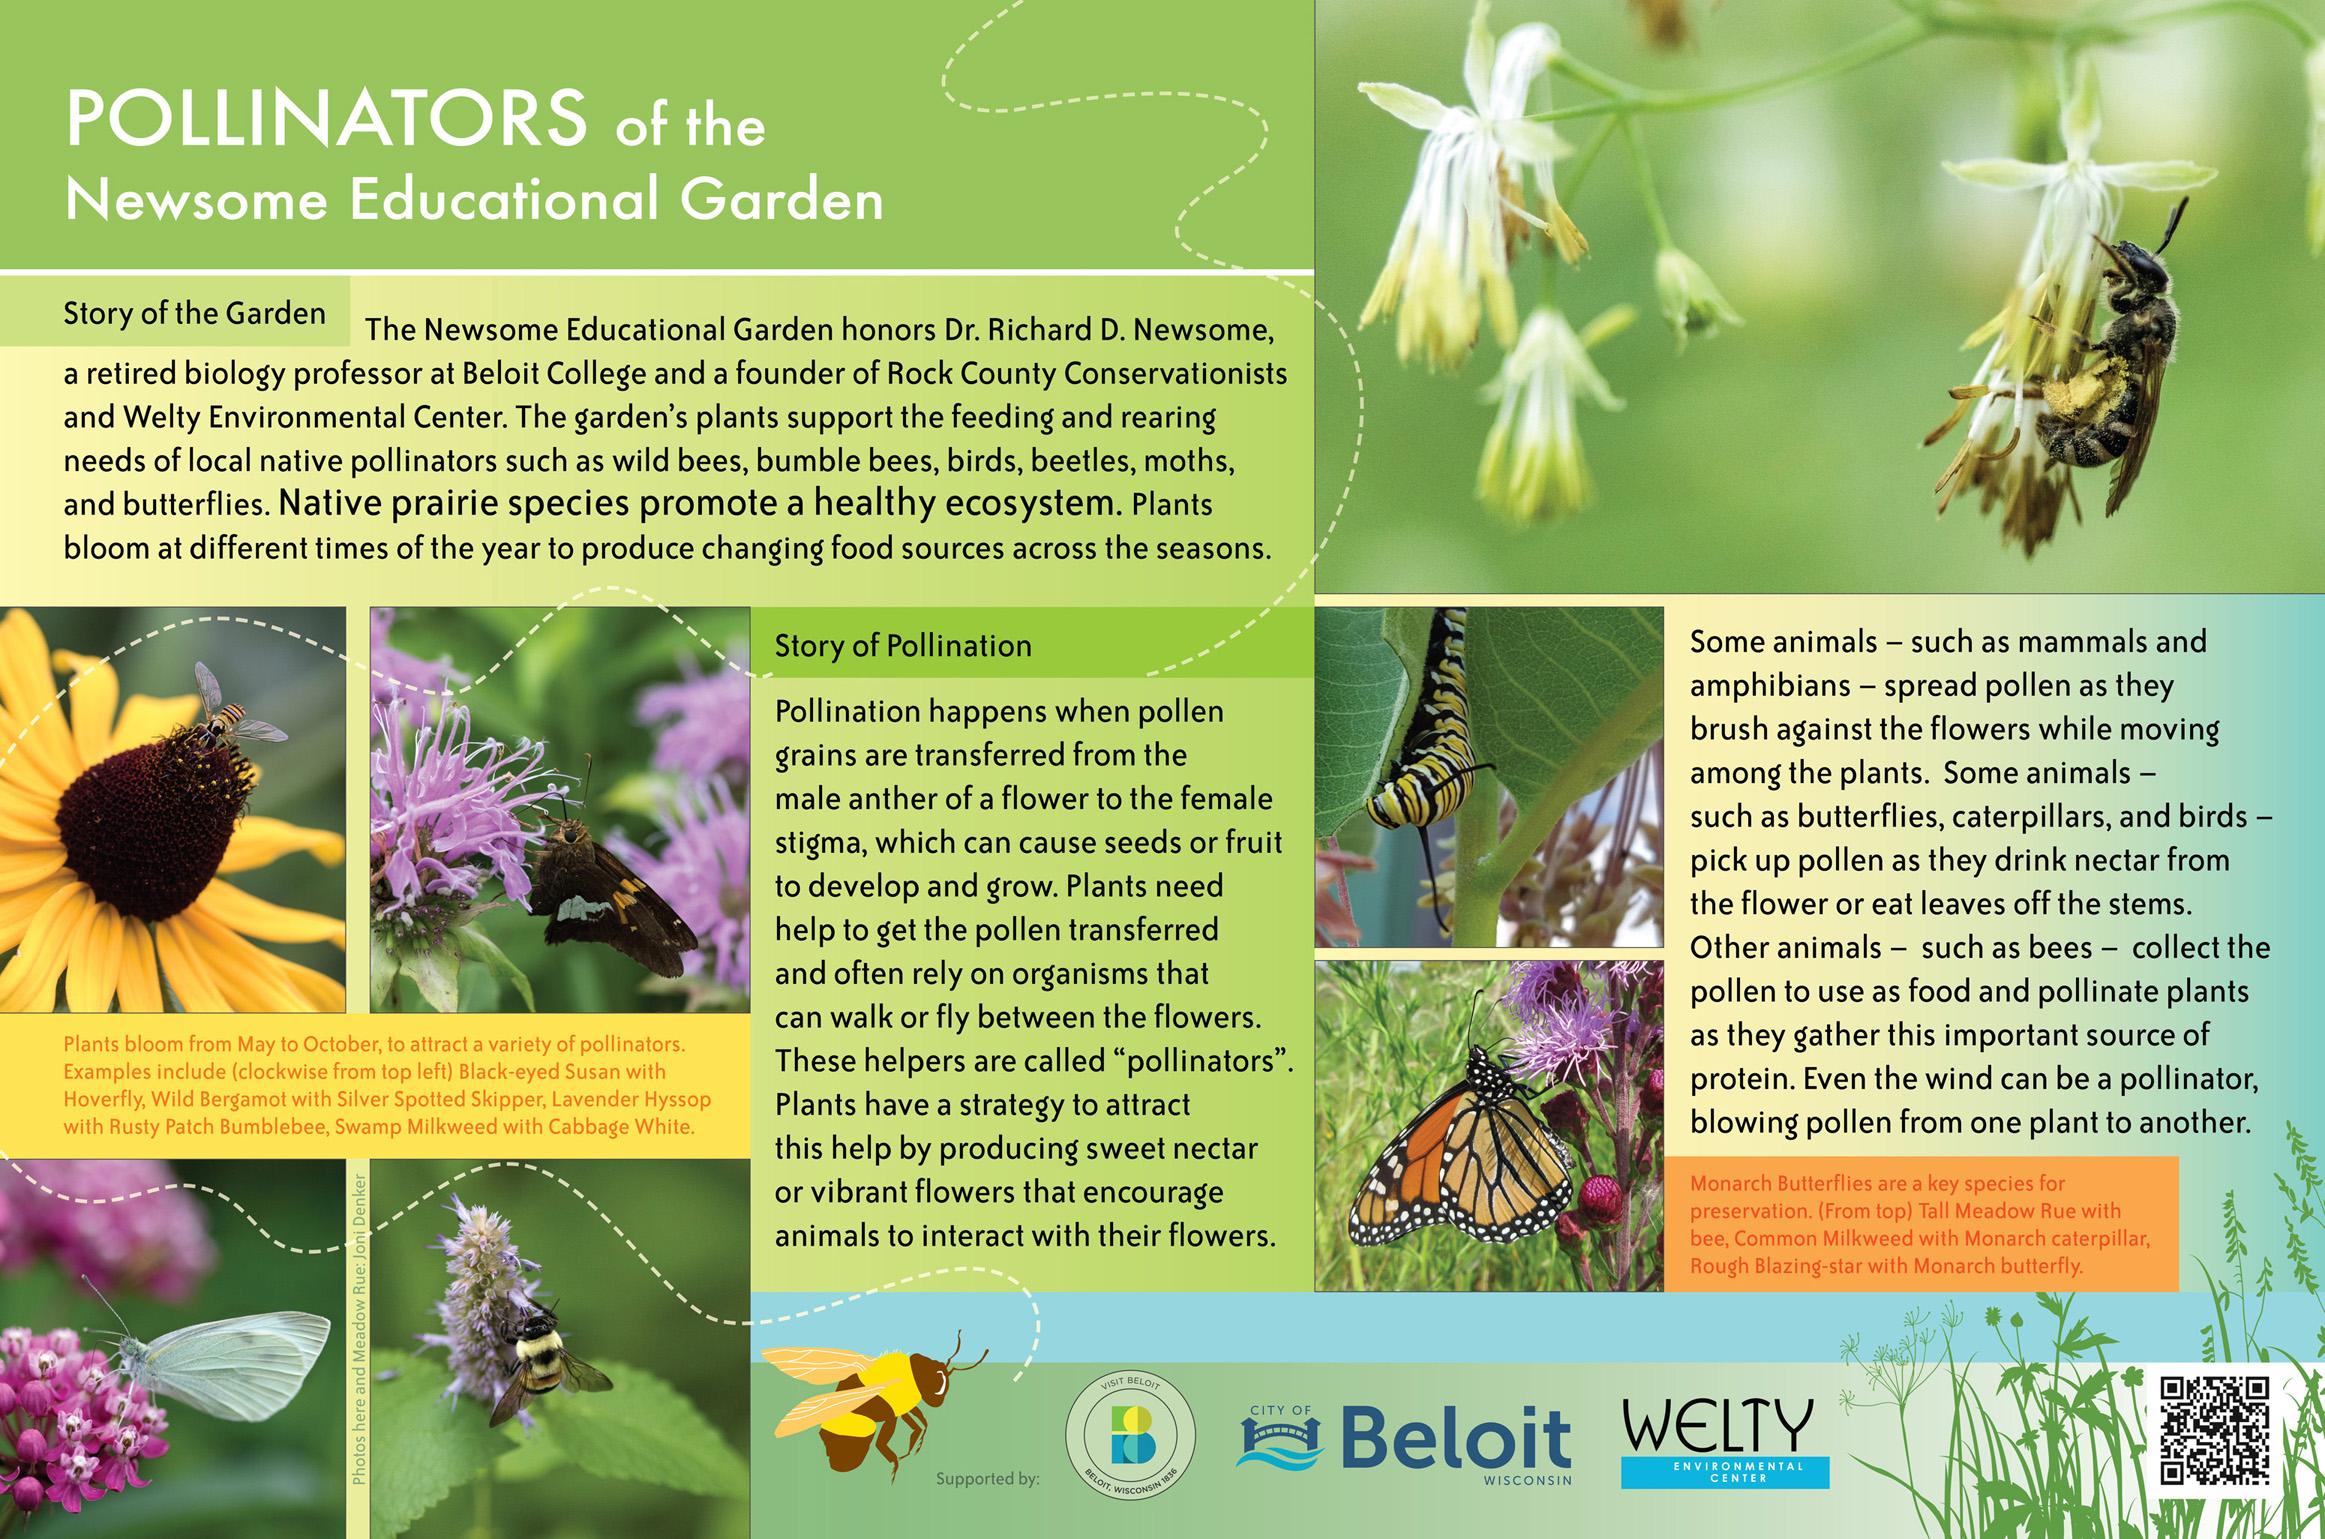 Sign4-Pollinators-LoP.jpg